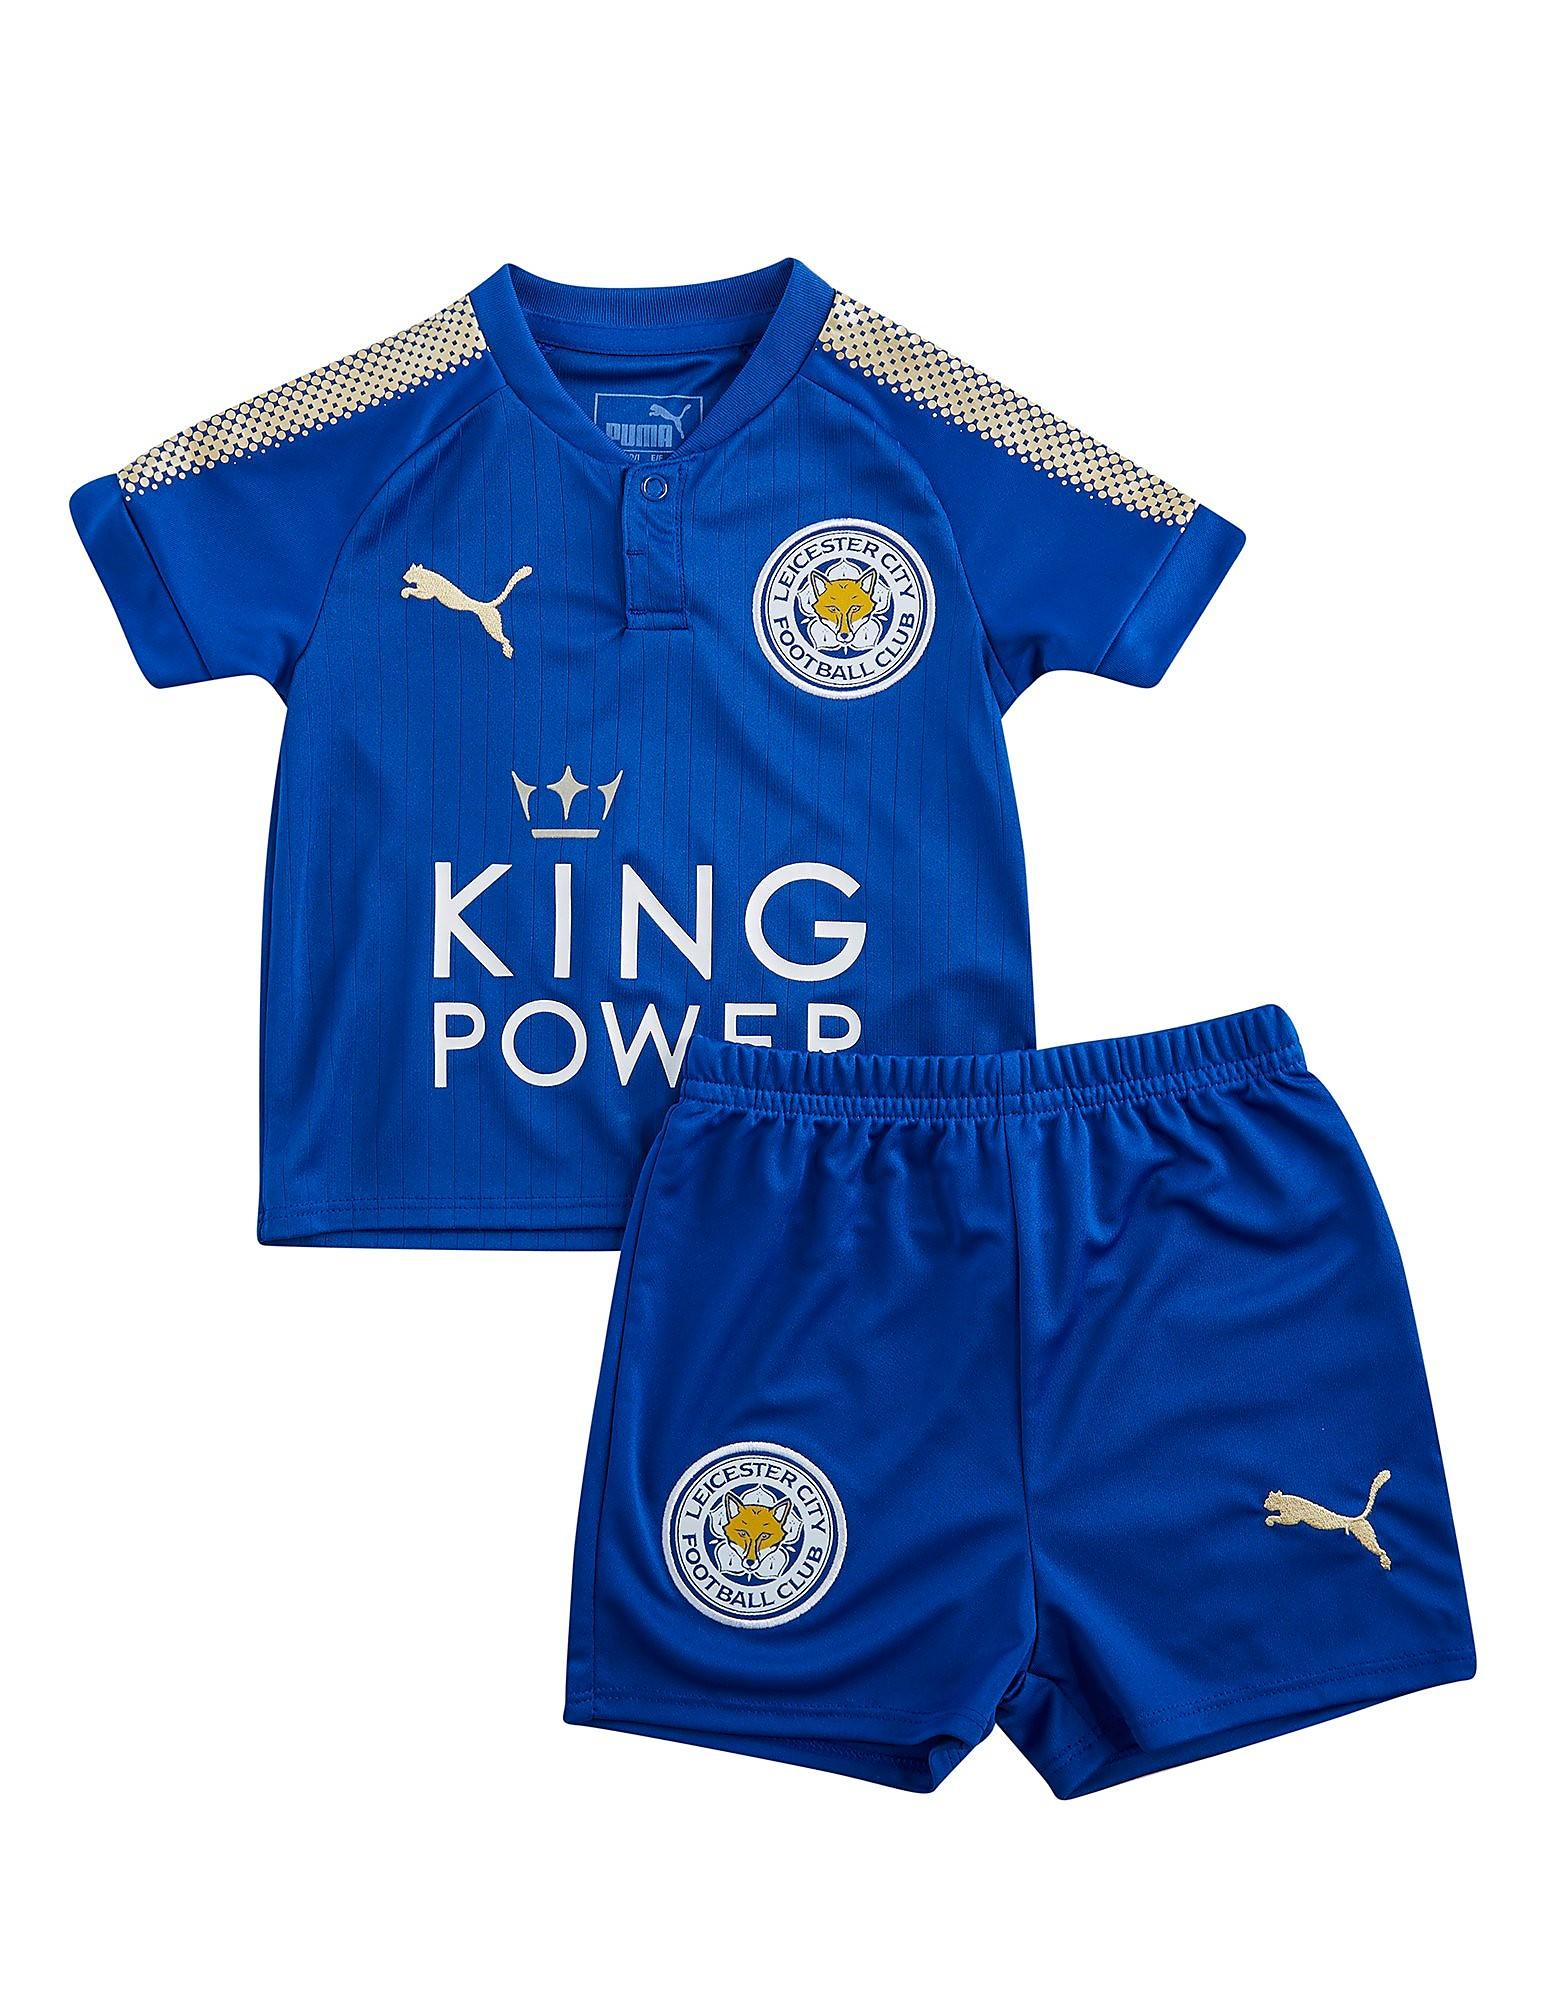 PUMA Leicester City FC 2017/18 Home Kit Children